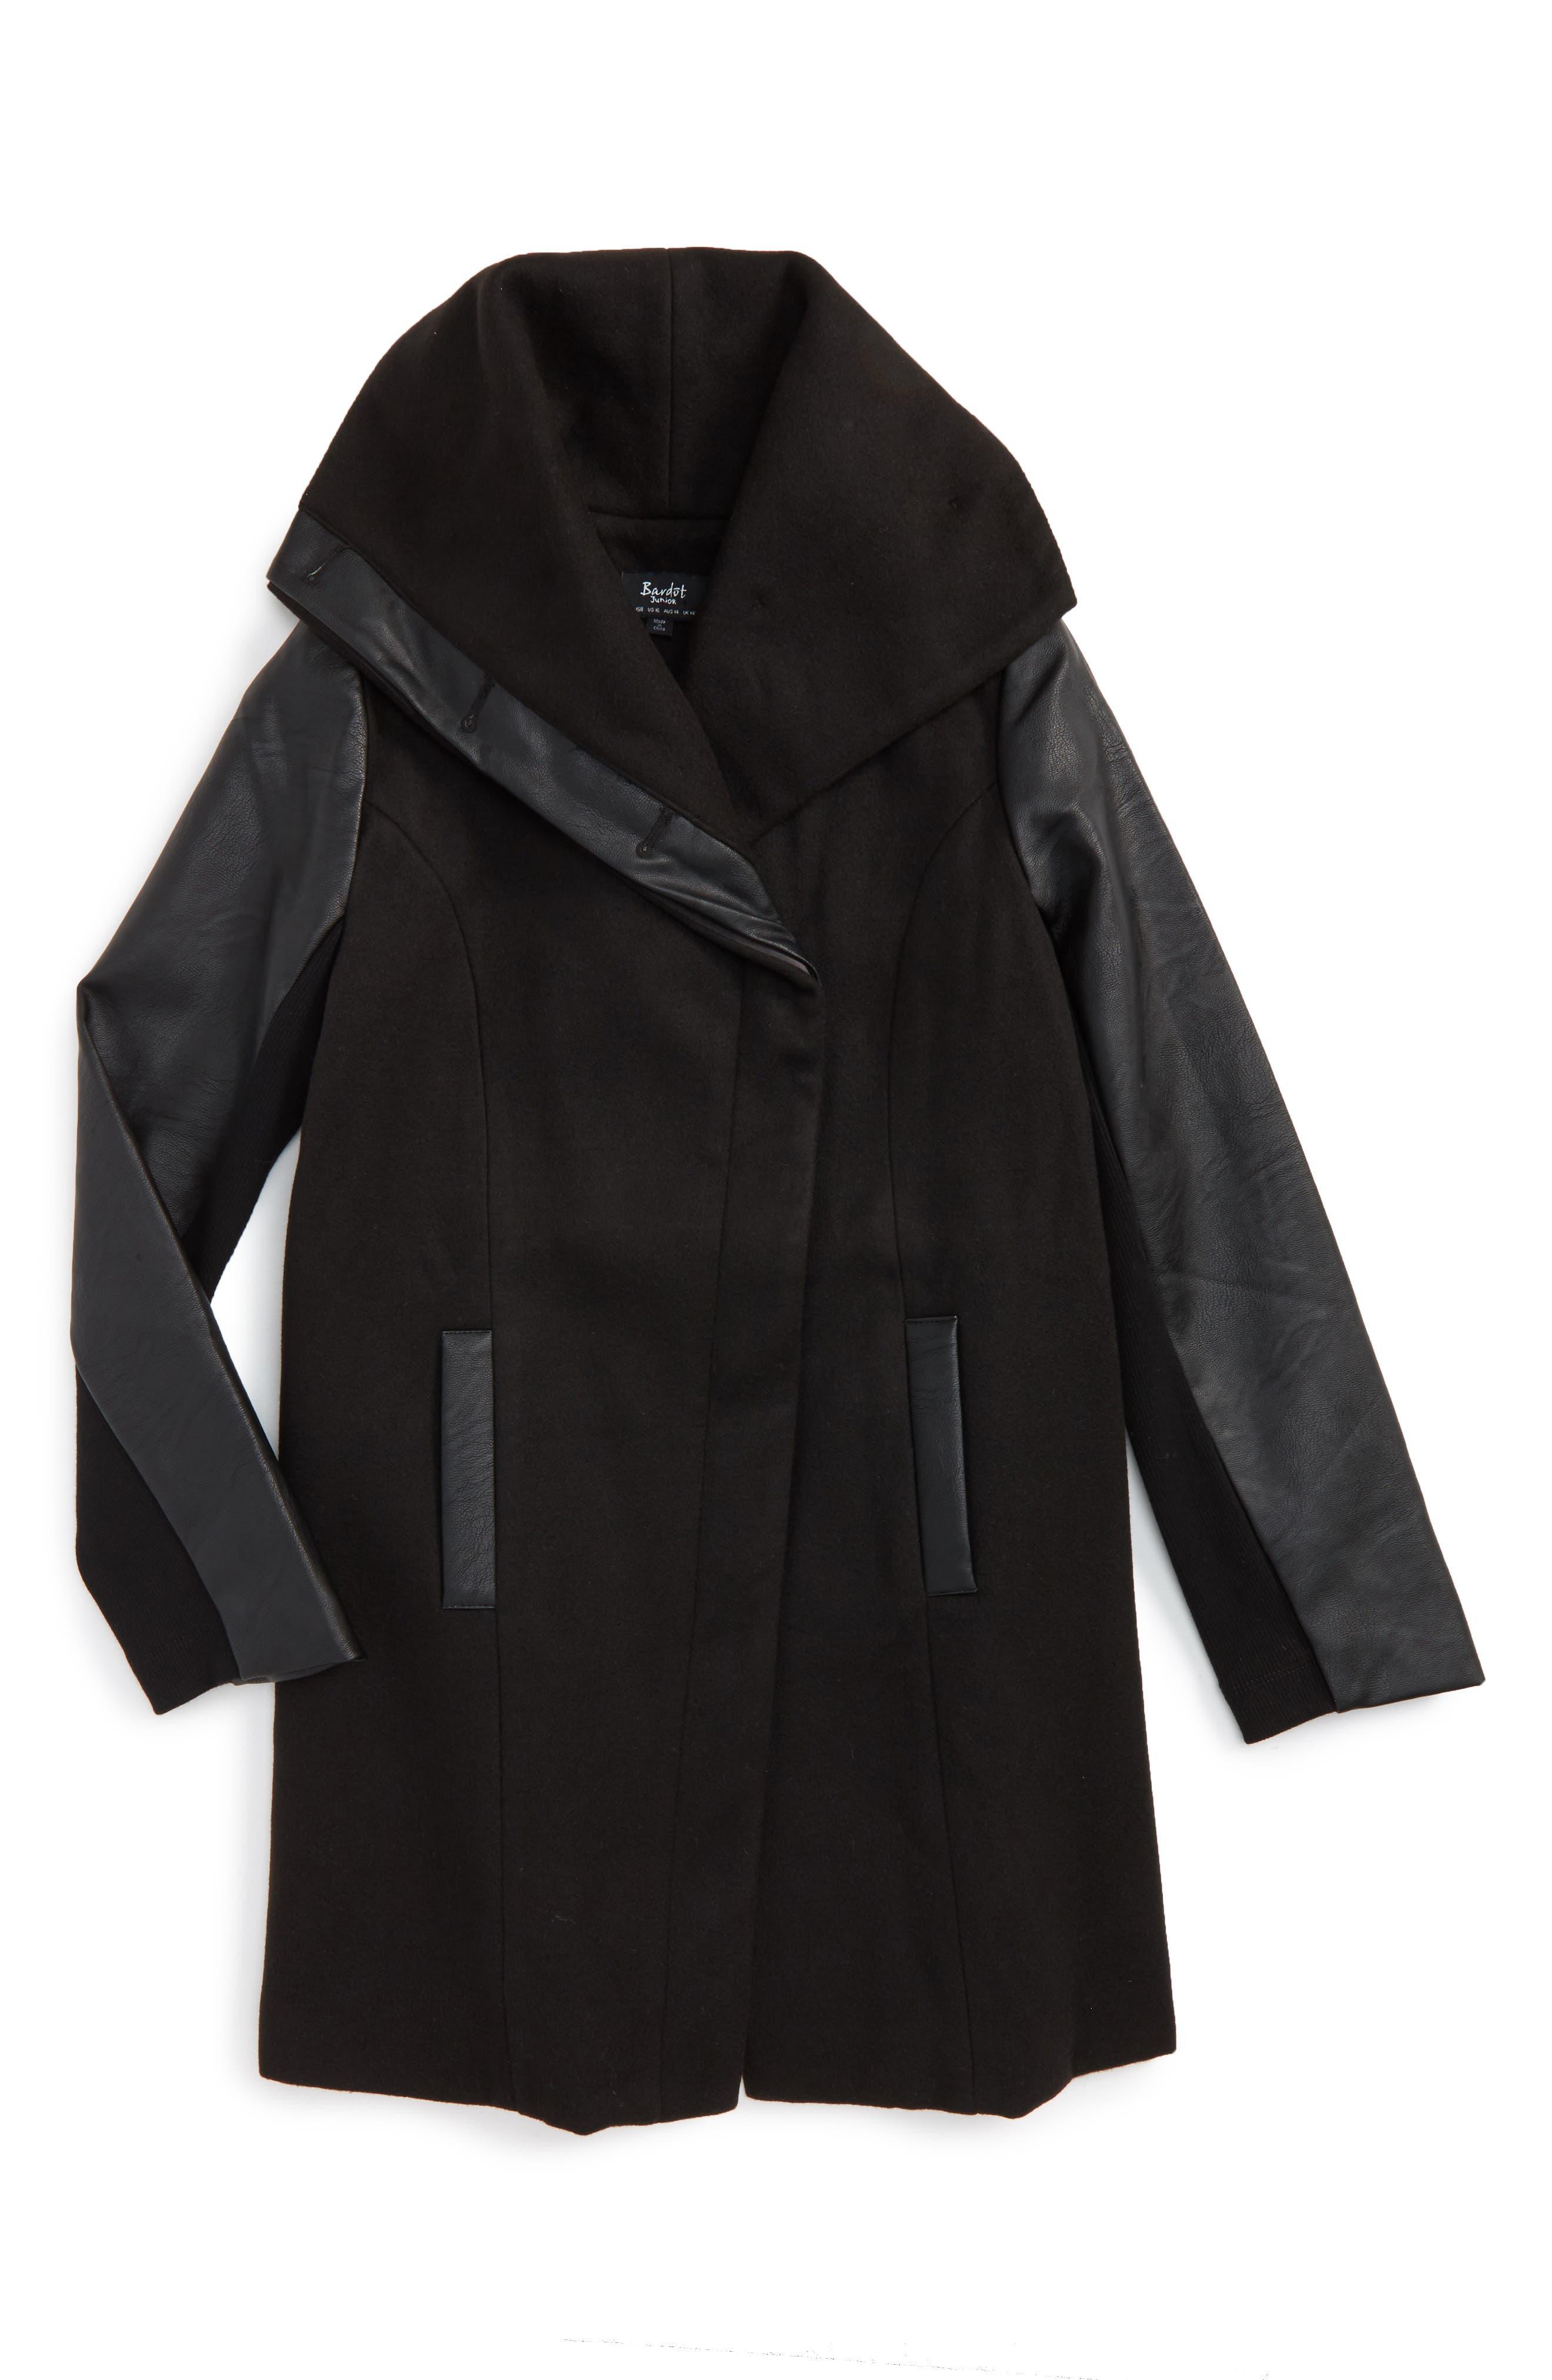 Alternate Image 1 Selected - Bardot Junior Raven Hooded Coat (Big Girls)